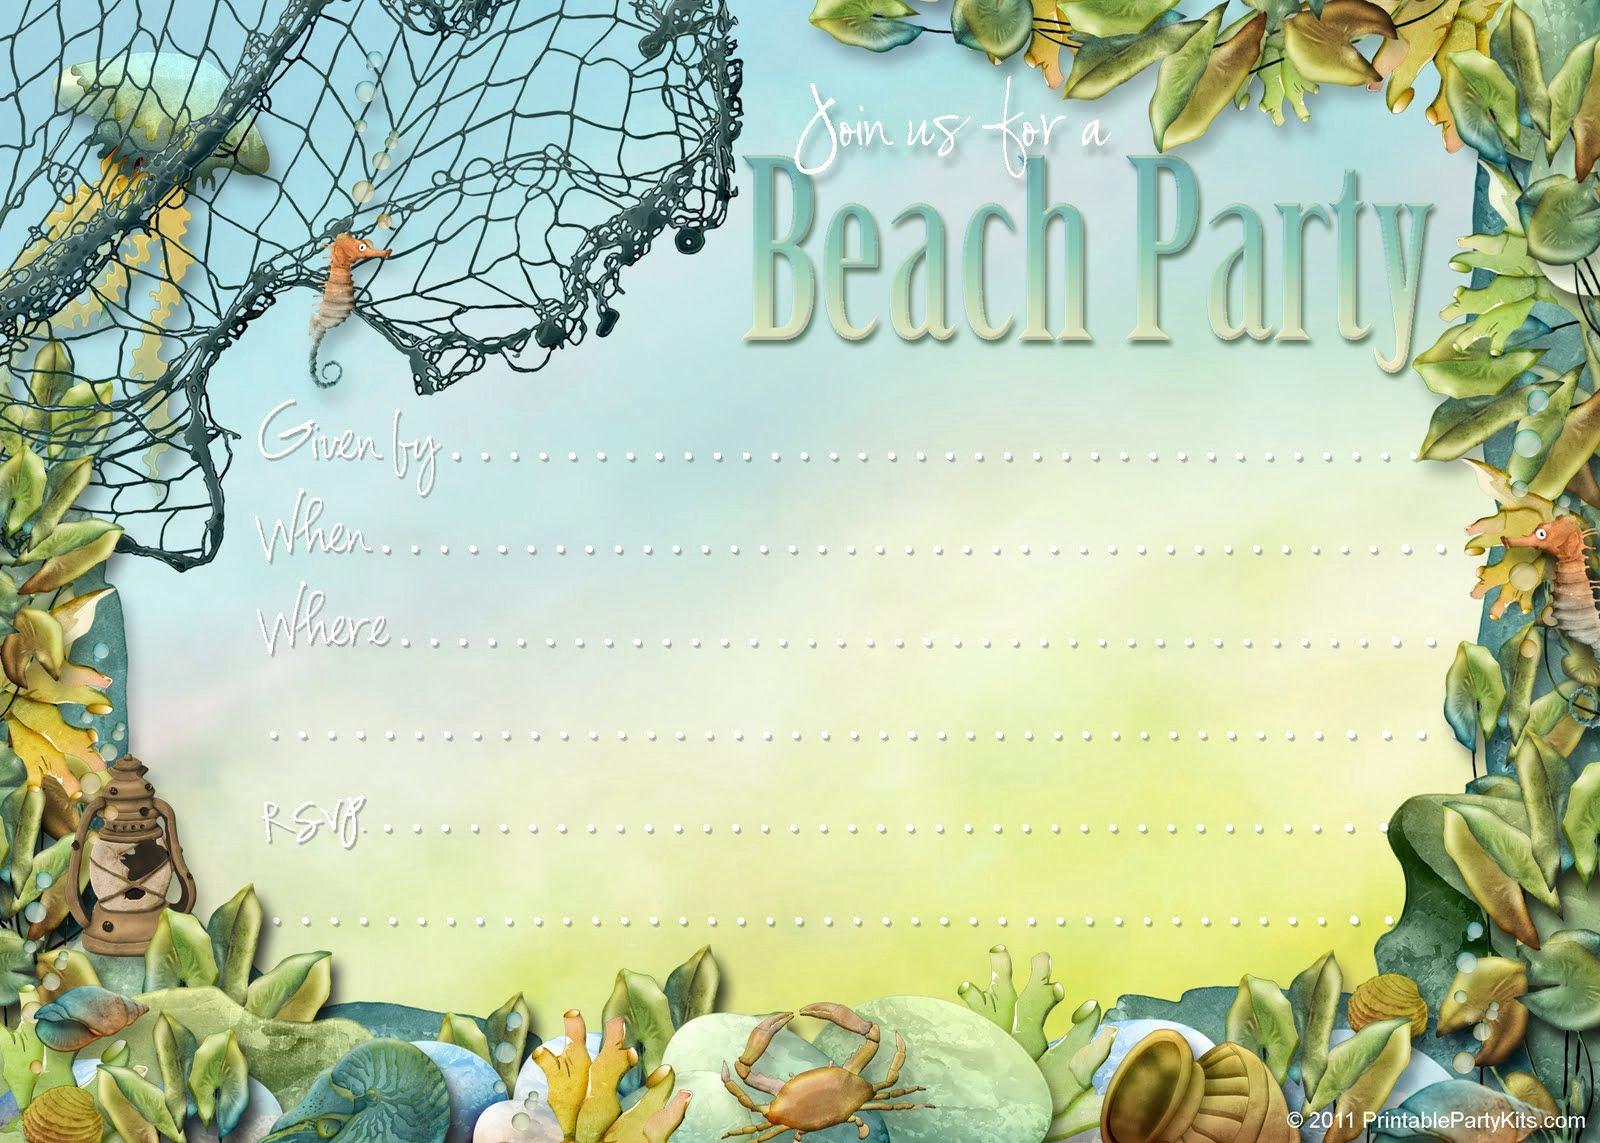 Beach Party Invitation Template Luxury Invitation Card Beach themed Invites Invite Card Ideas